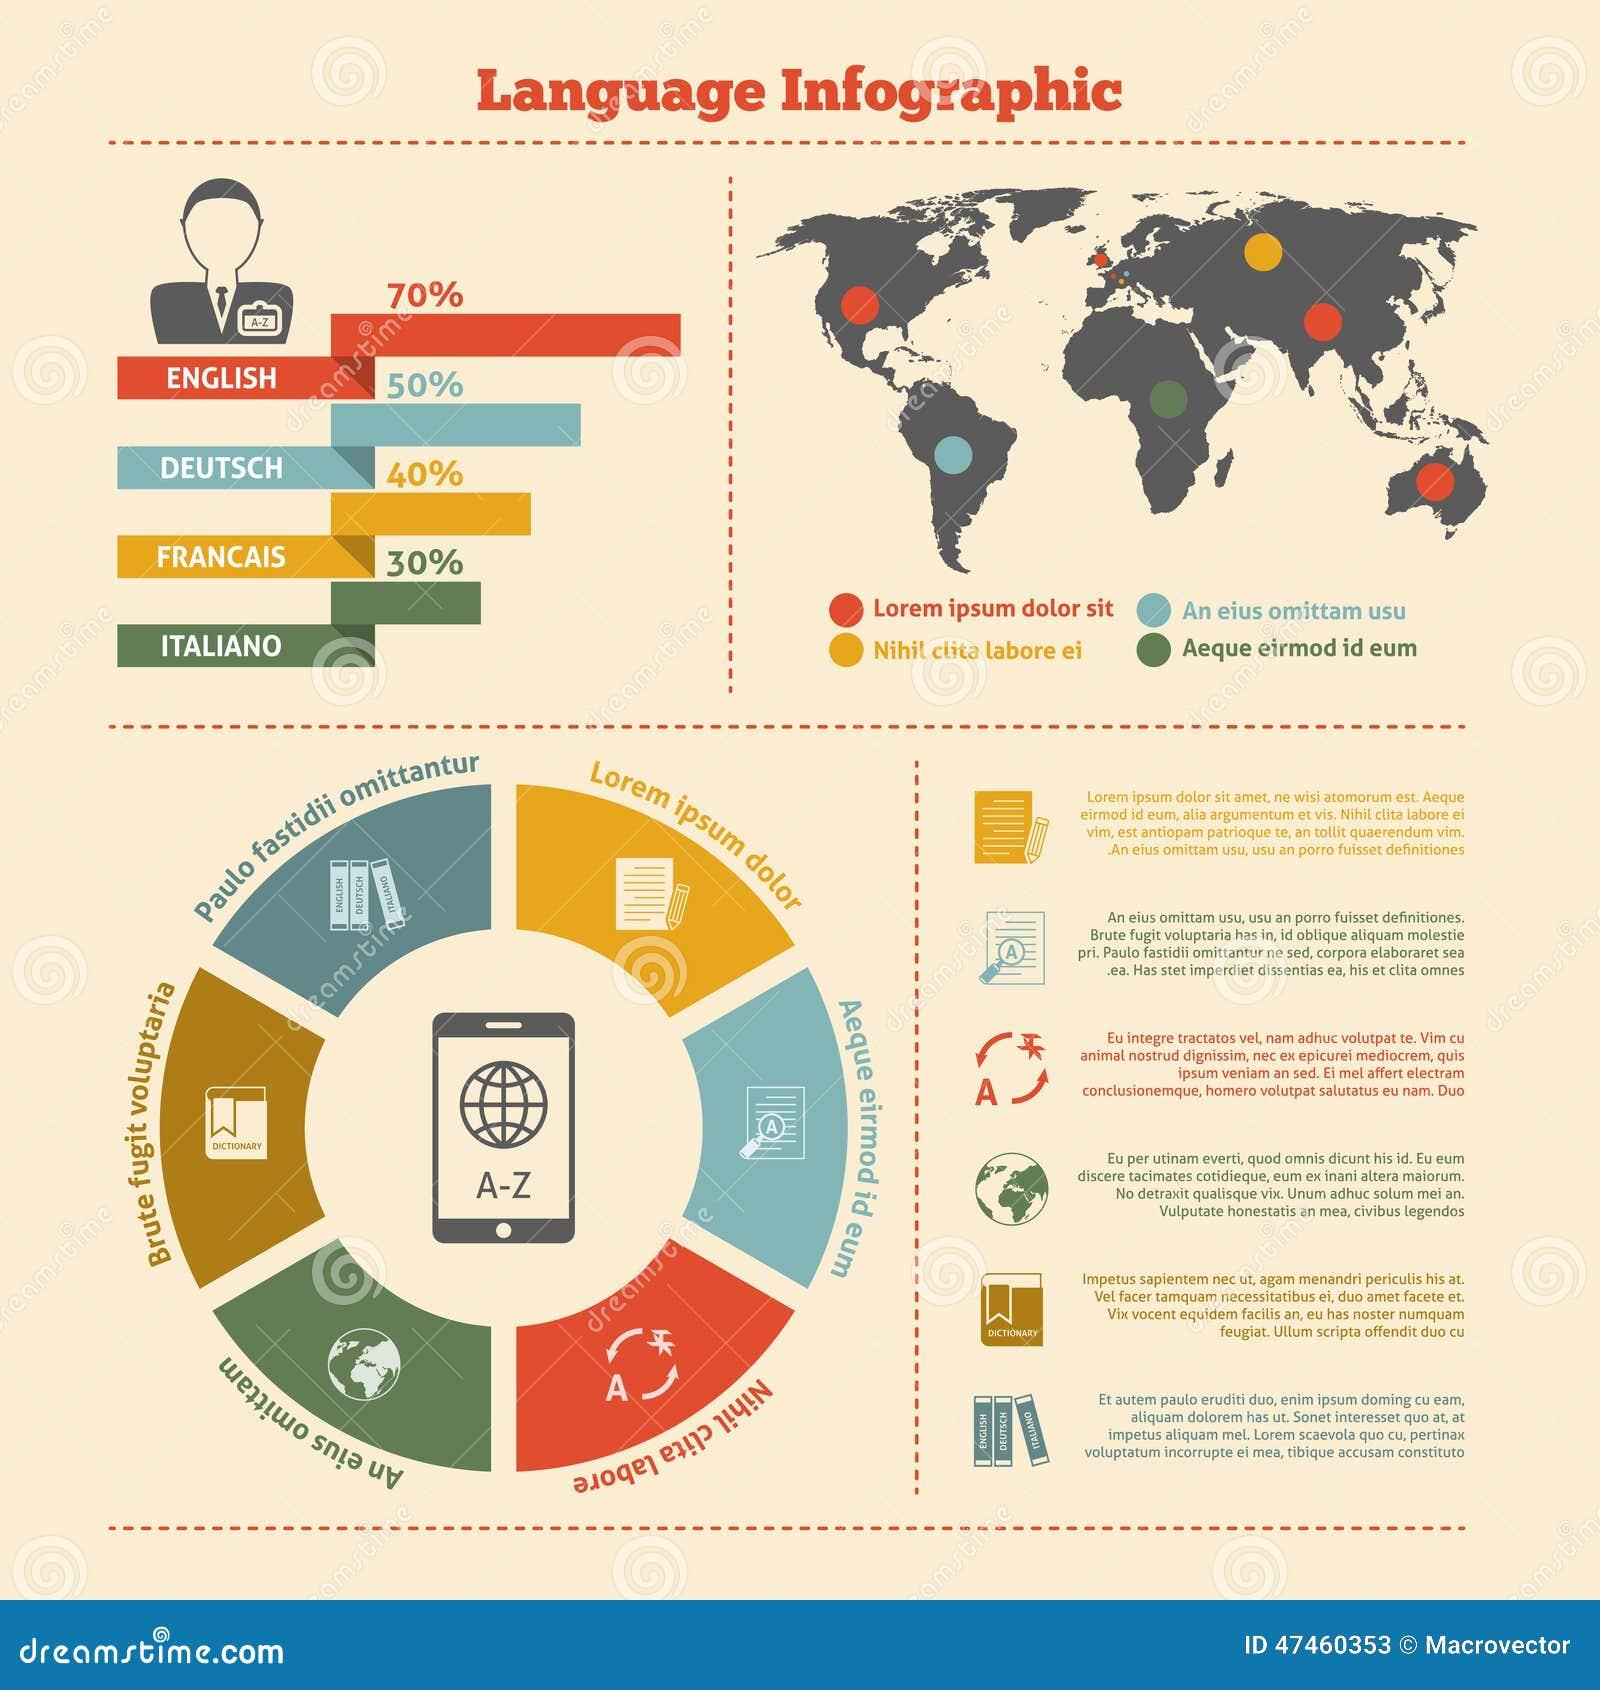 german to english word document translation